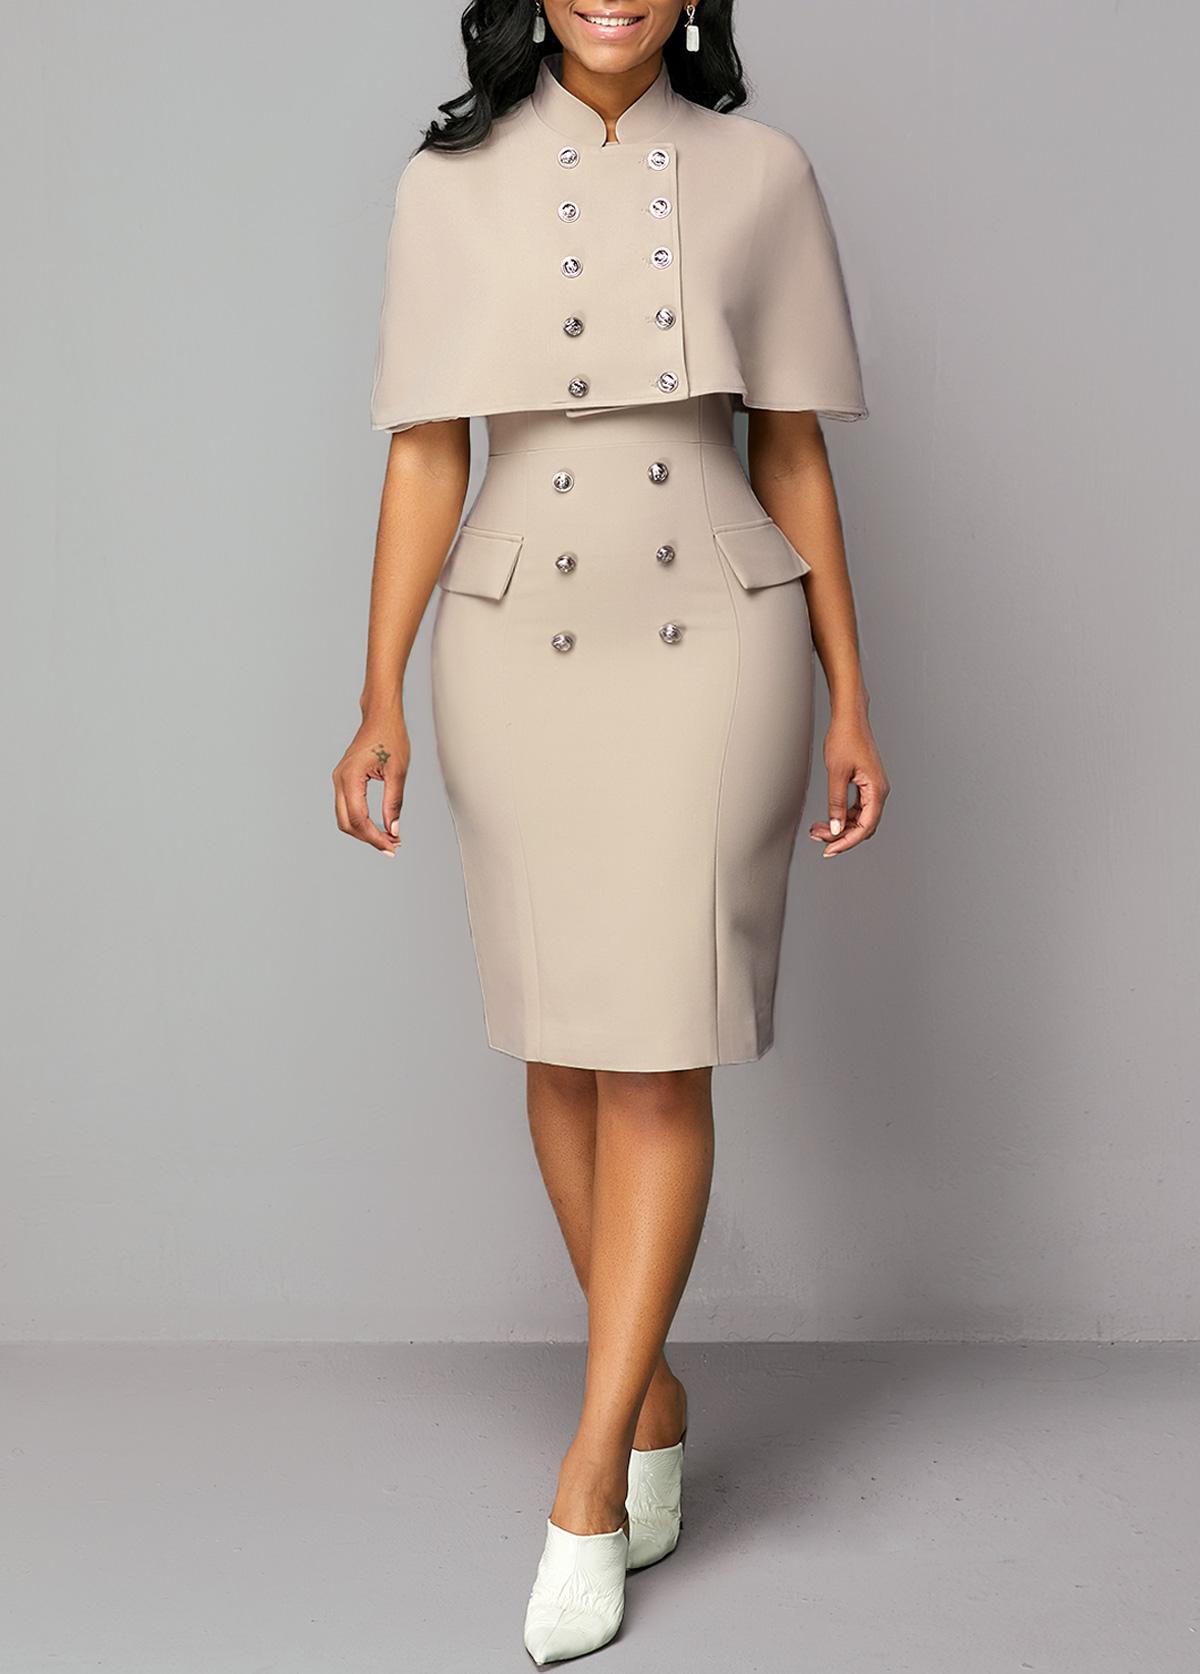 Cap Shoulder Top and Button Detail Back Slit Dress